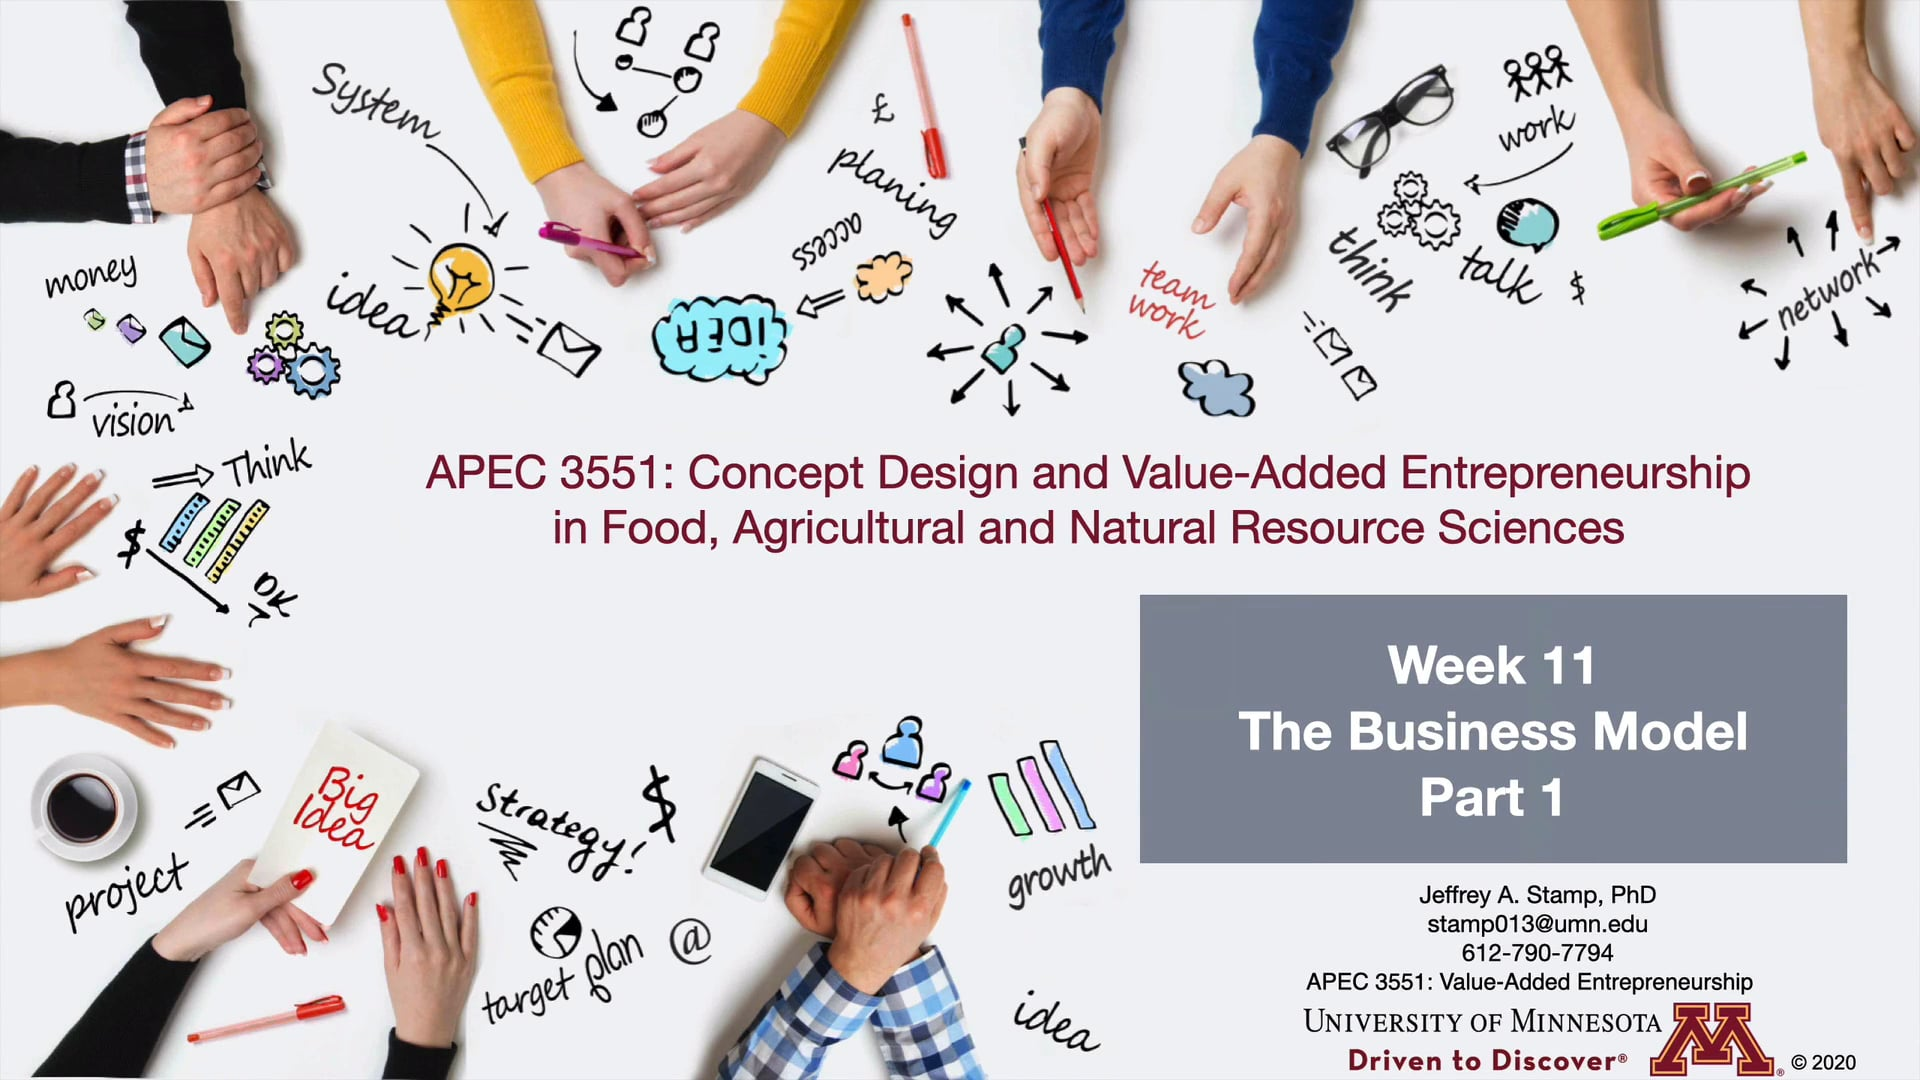 APEC 3551 F2020 Week 11 Video 1 Part 1 Business Model